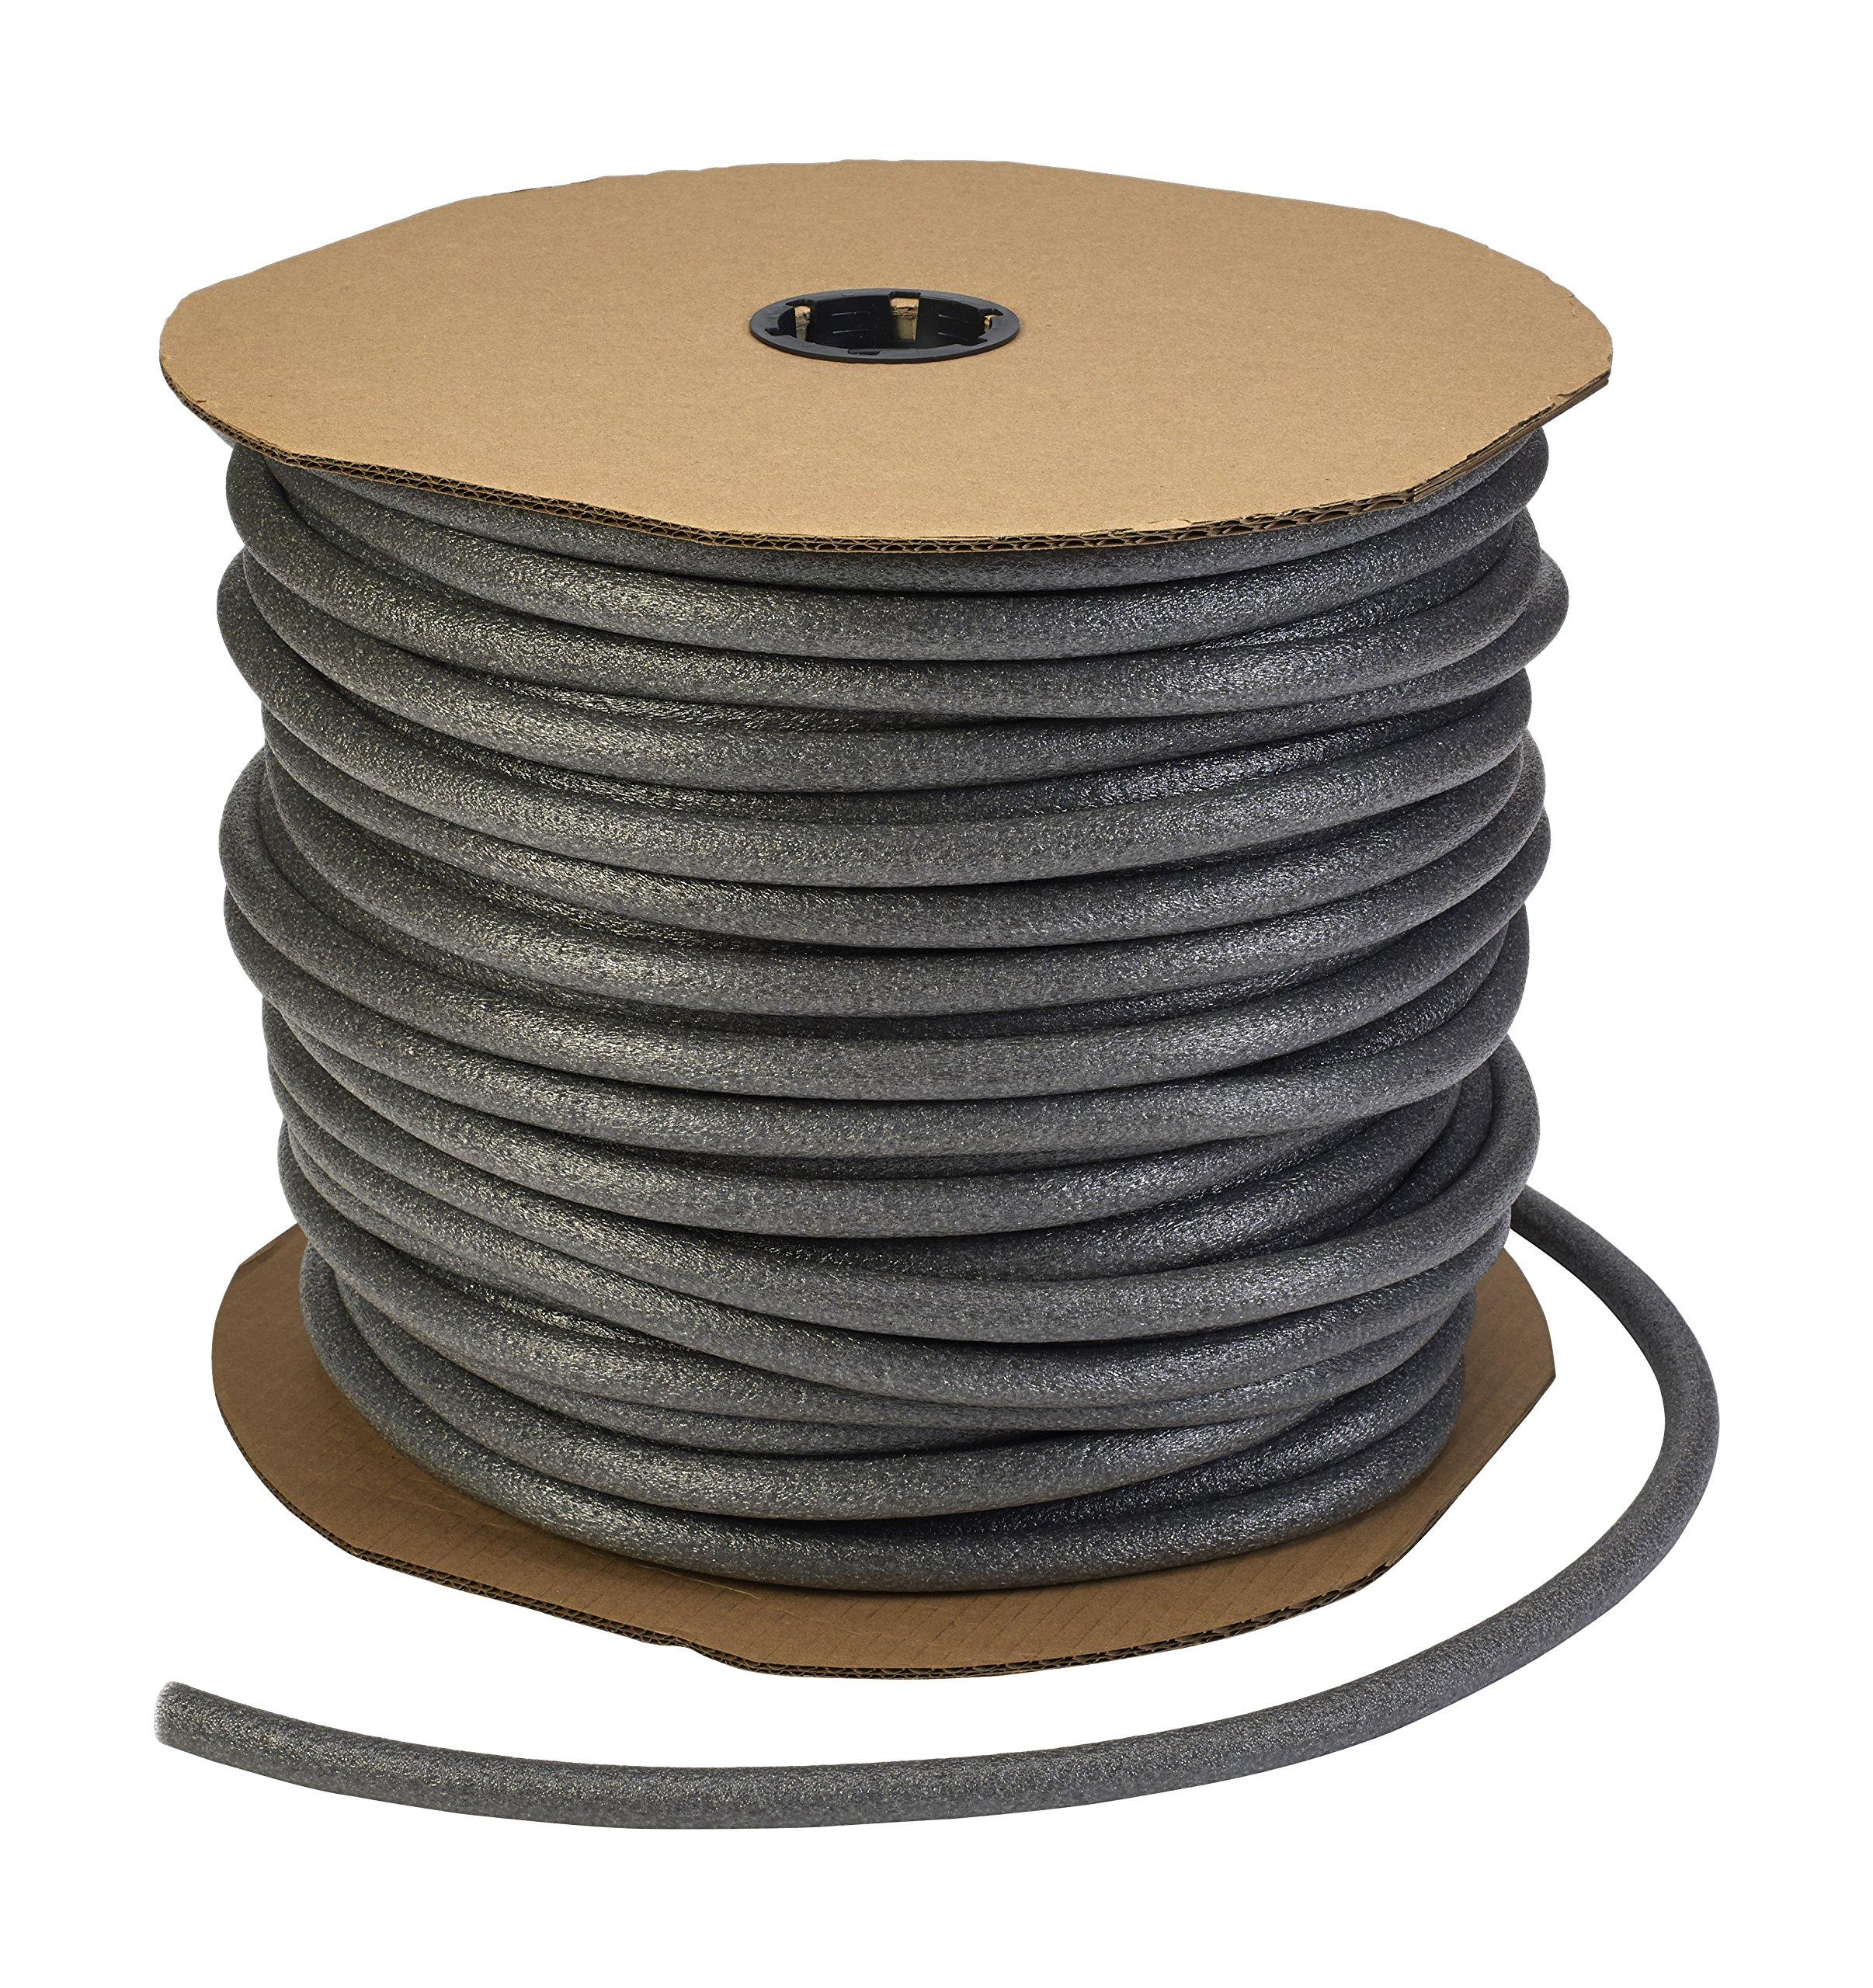 Mutual Industries 500-0-0 Standard Backer Rod, 2500 Linear Feet, 1/2'' by Mutual Industries